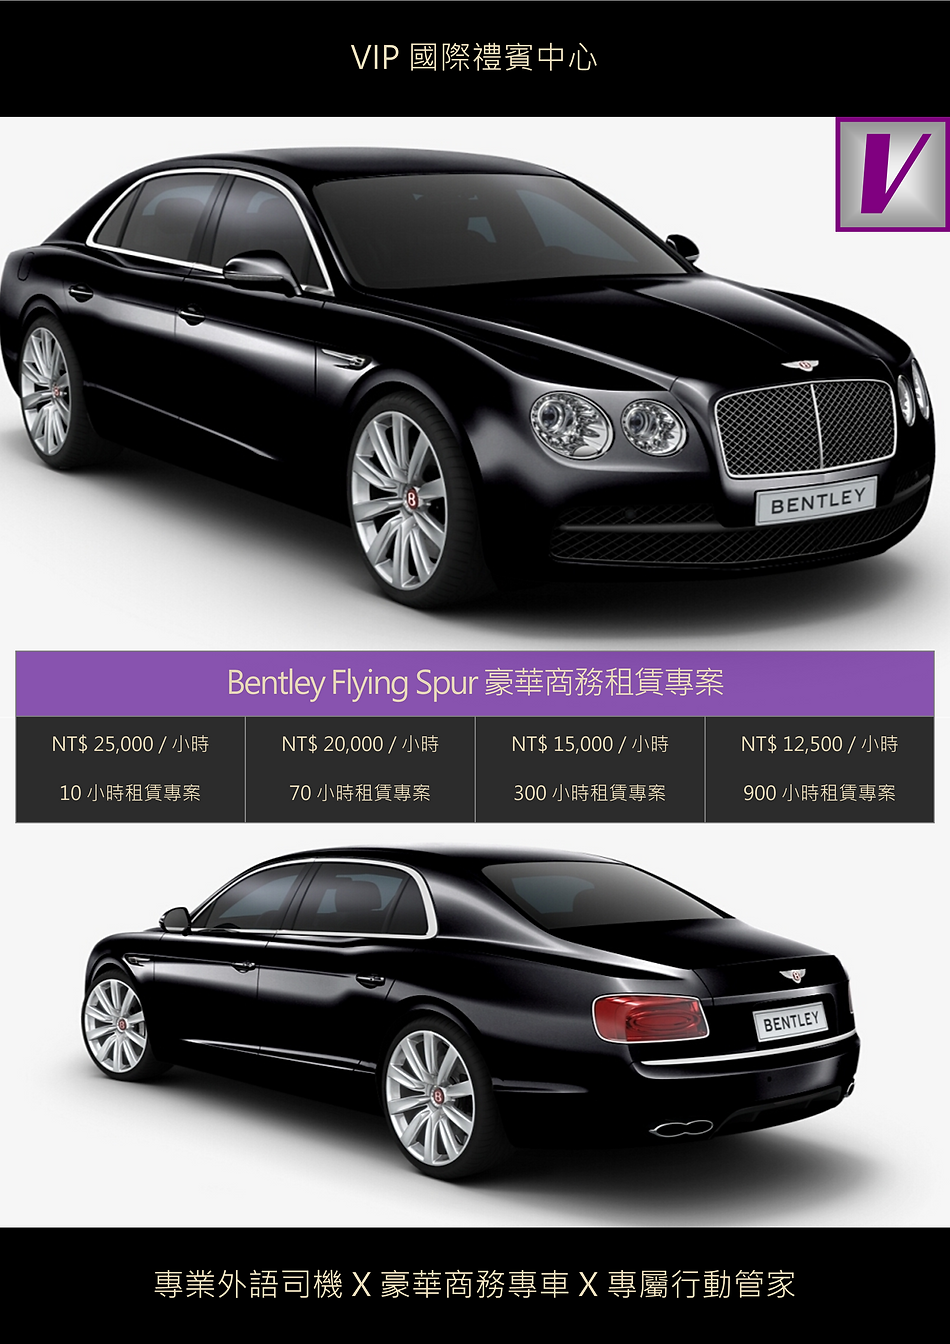 VIP國際禮賓中心 BENTLEY FLYING SPUR BLACK 豪華商務租賃專案 DM.png